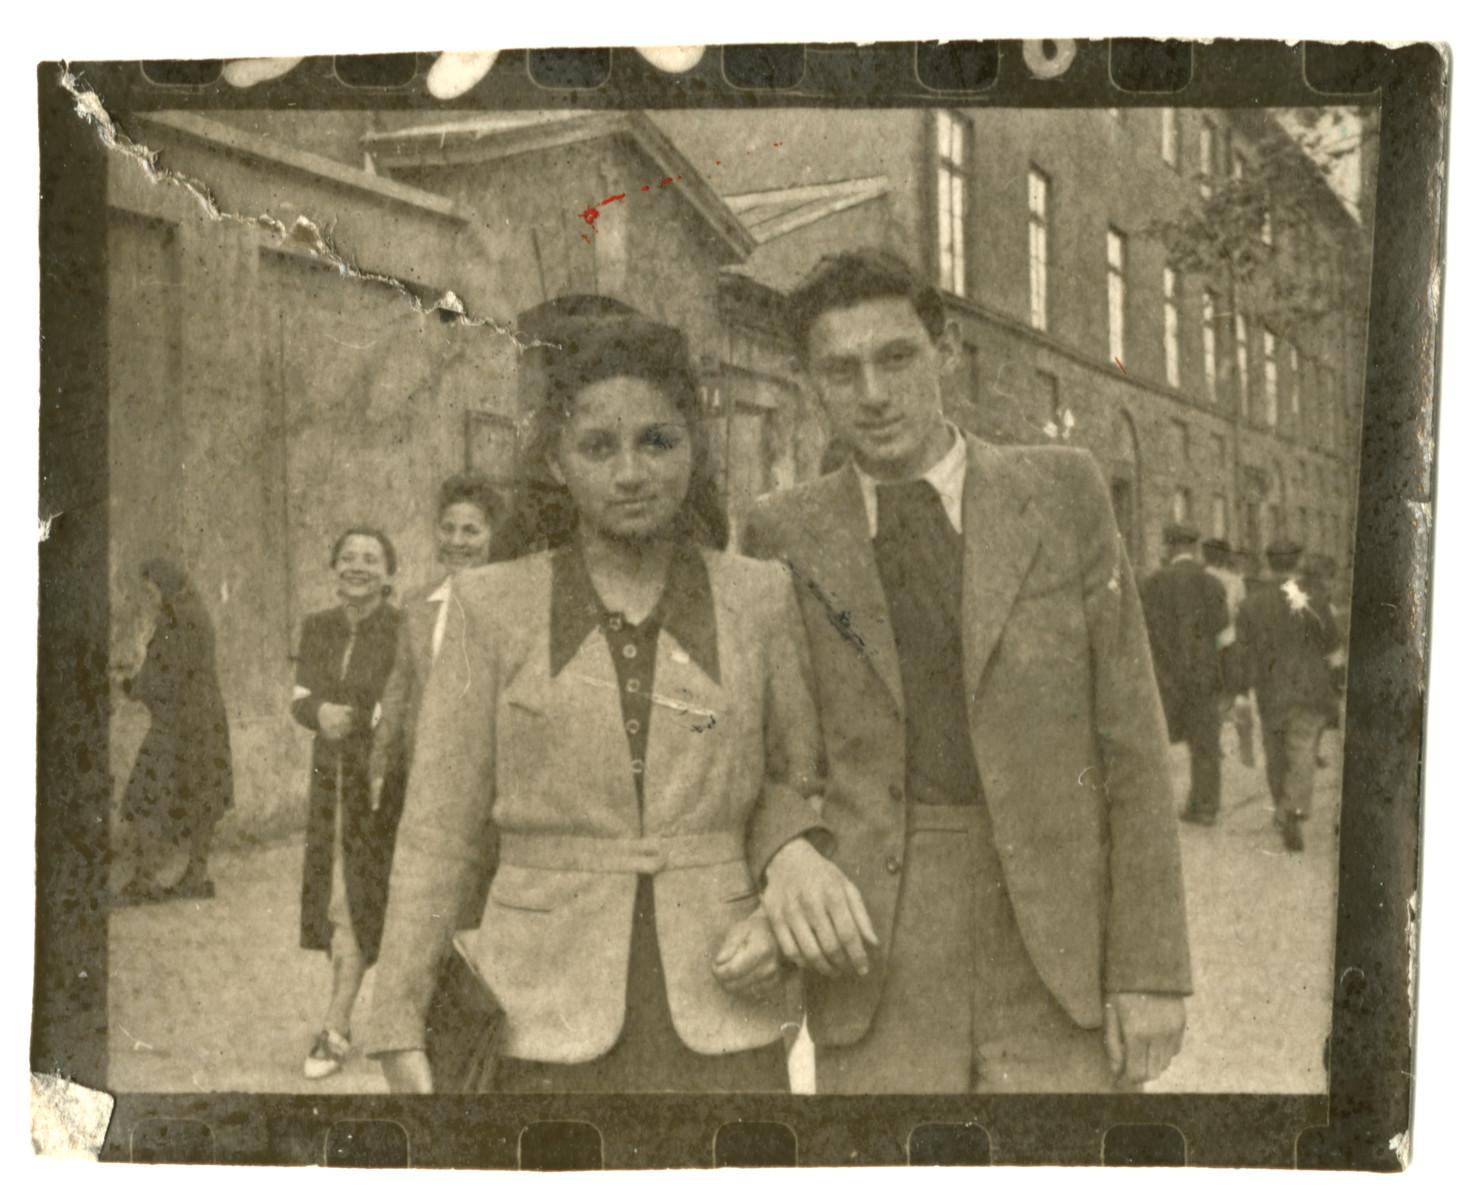 Miriam Wattenberg walks down a street in the Warsaw ghetto arm in arm with her with boyfriend Romek Kowalski.